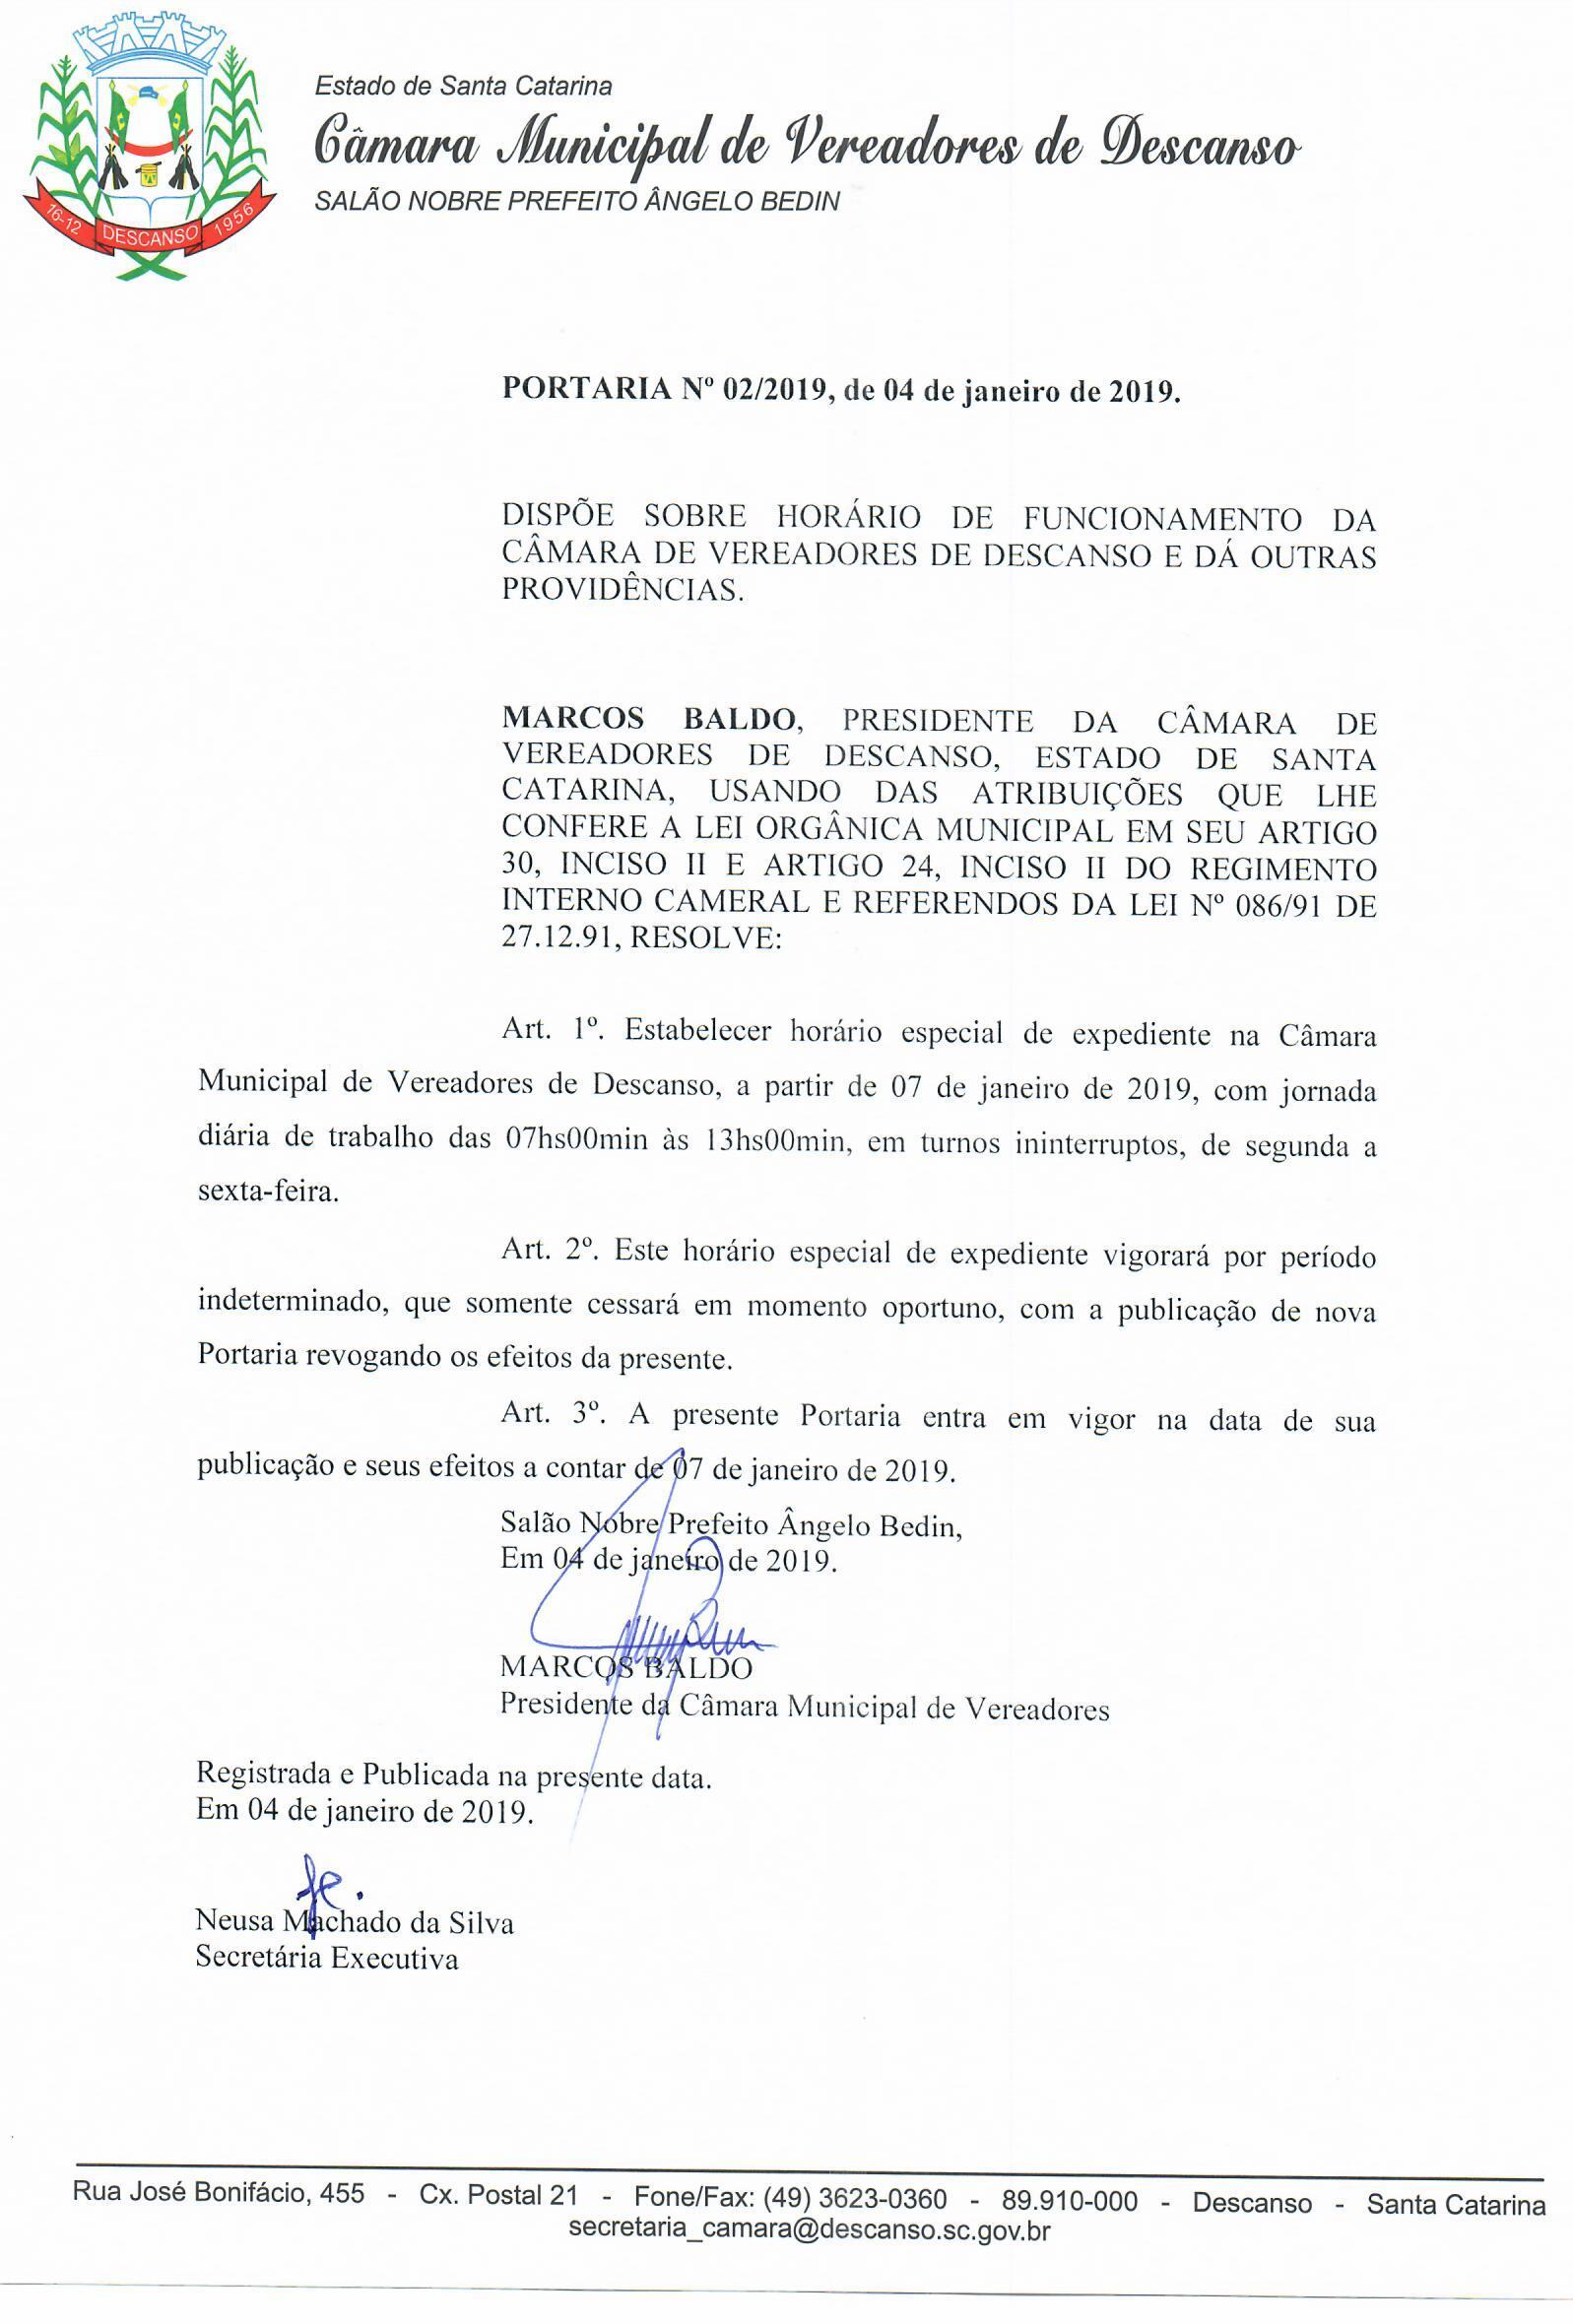 PORTARIA Nº 02/2019